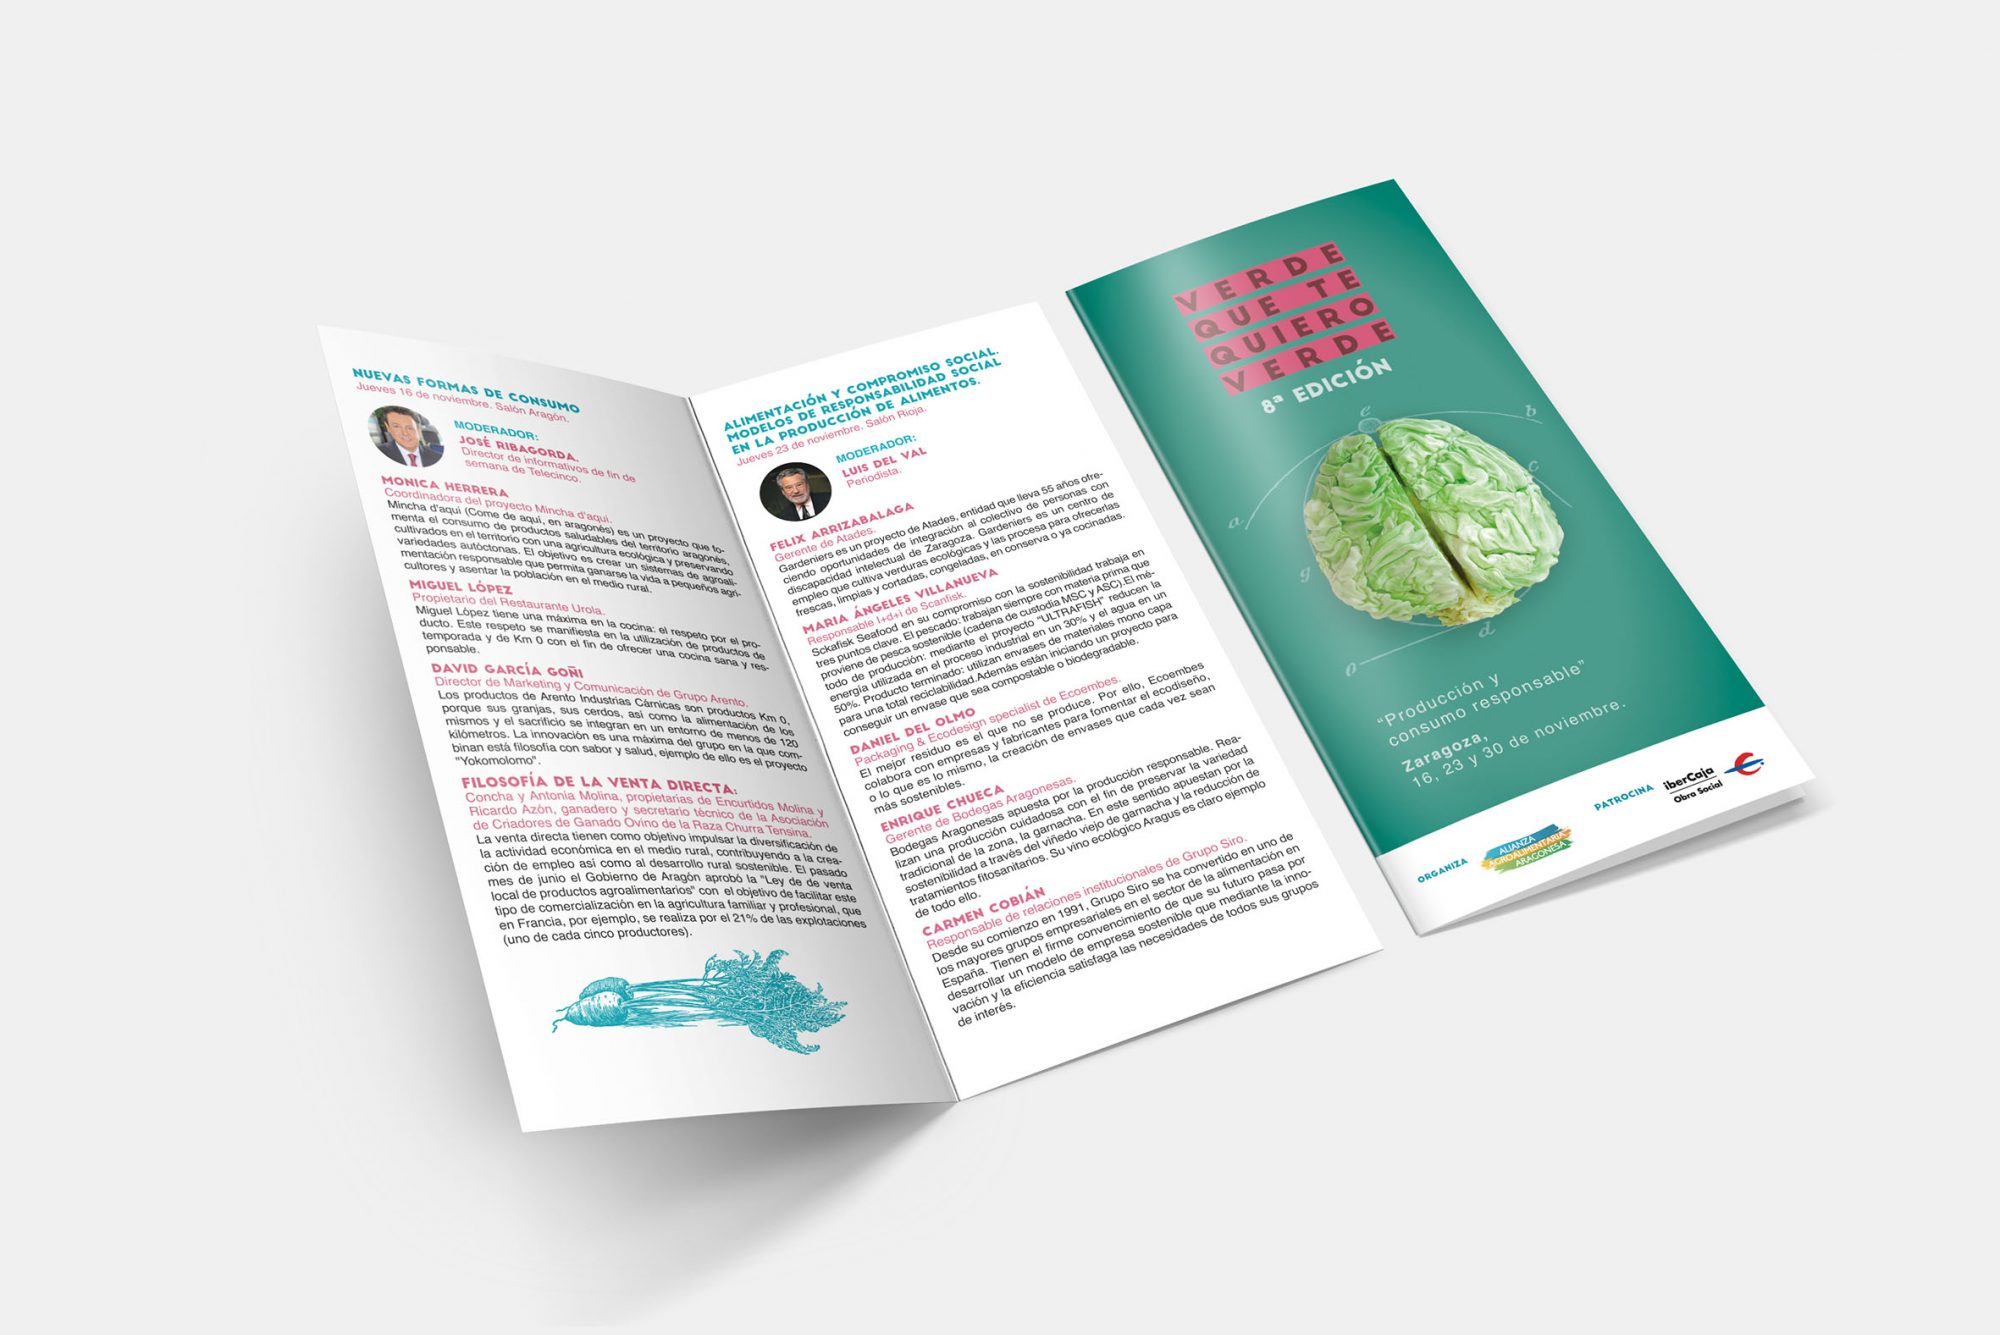 folleto vqv